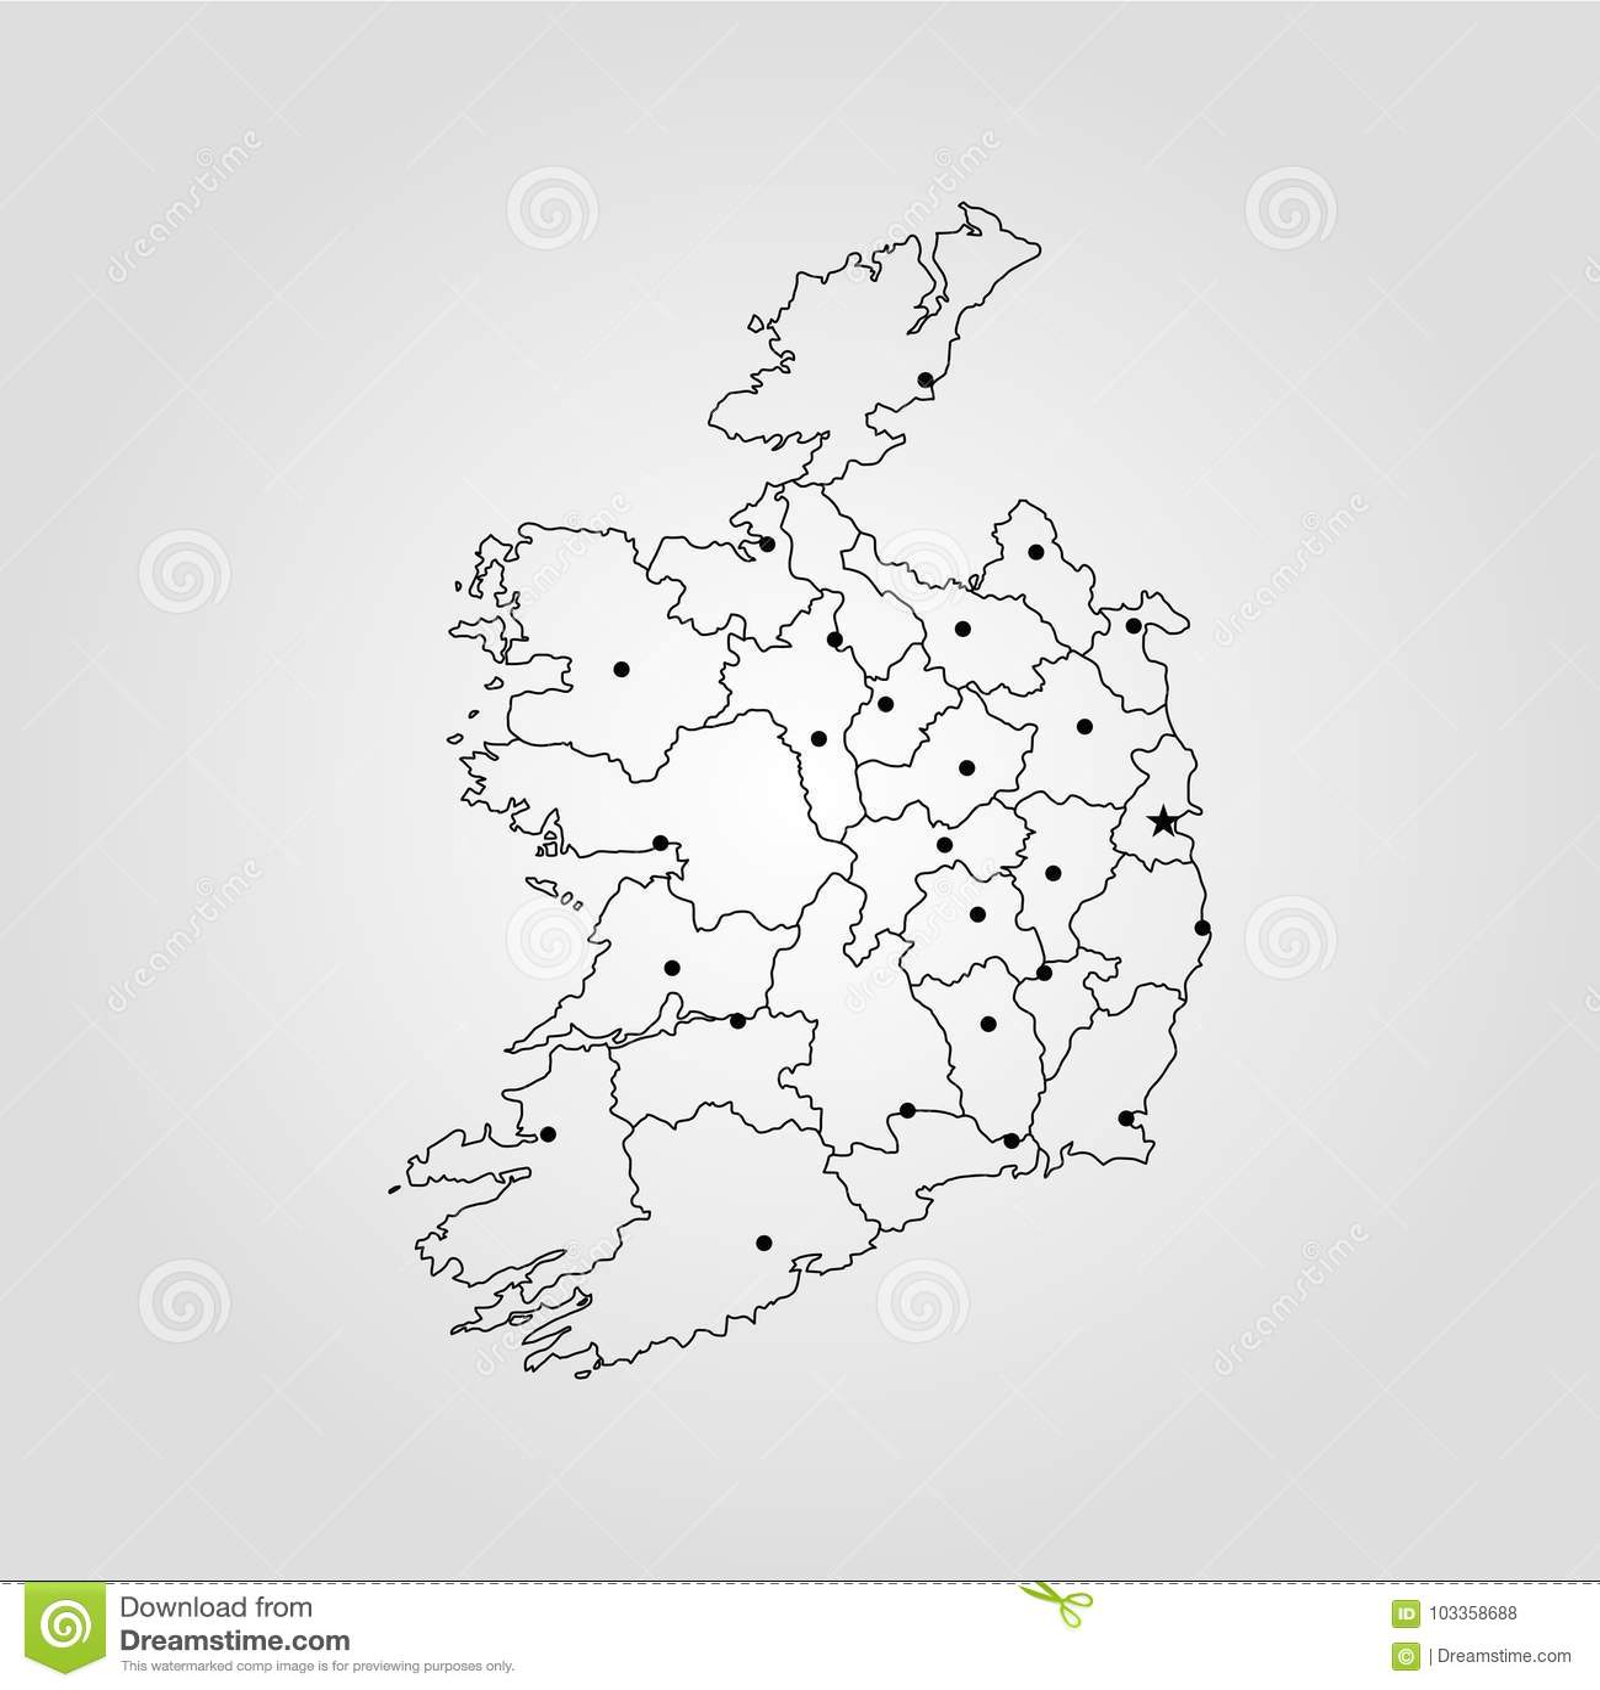 Map Of Ireland Stock Illustration Illustration Of Europe 103358688